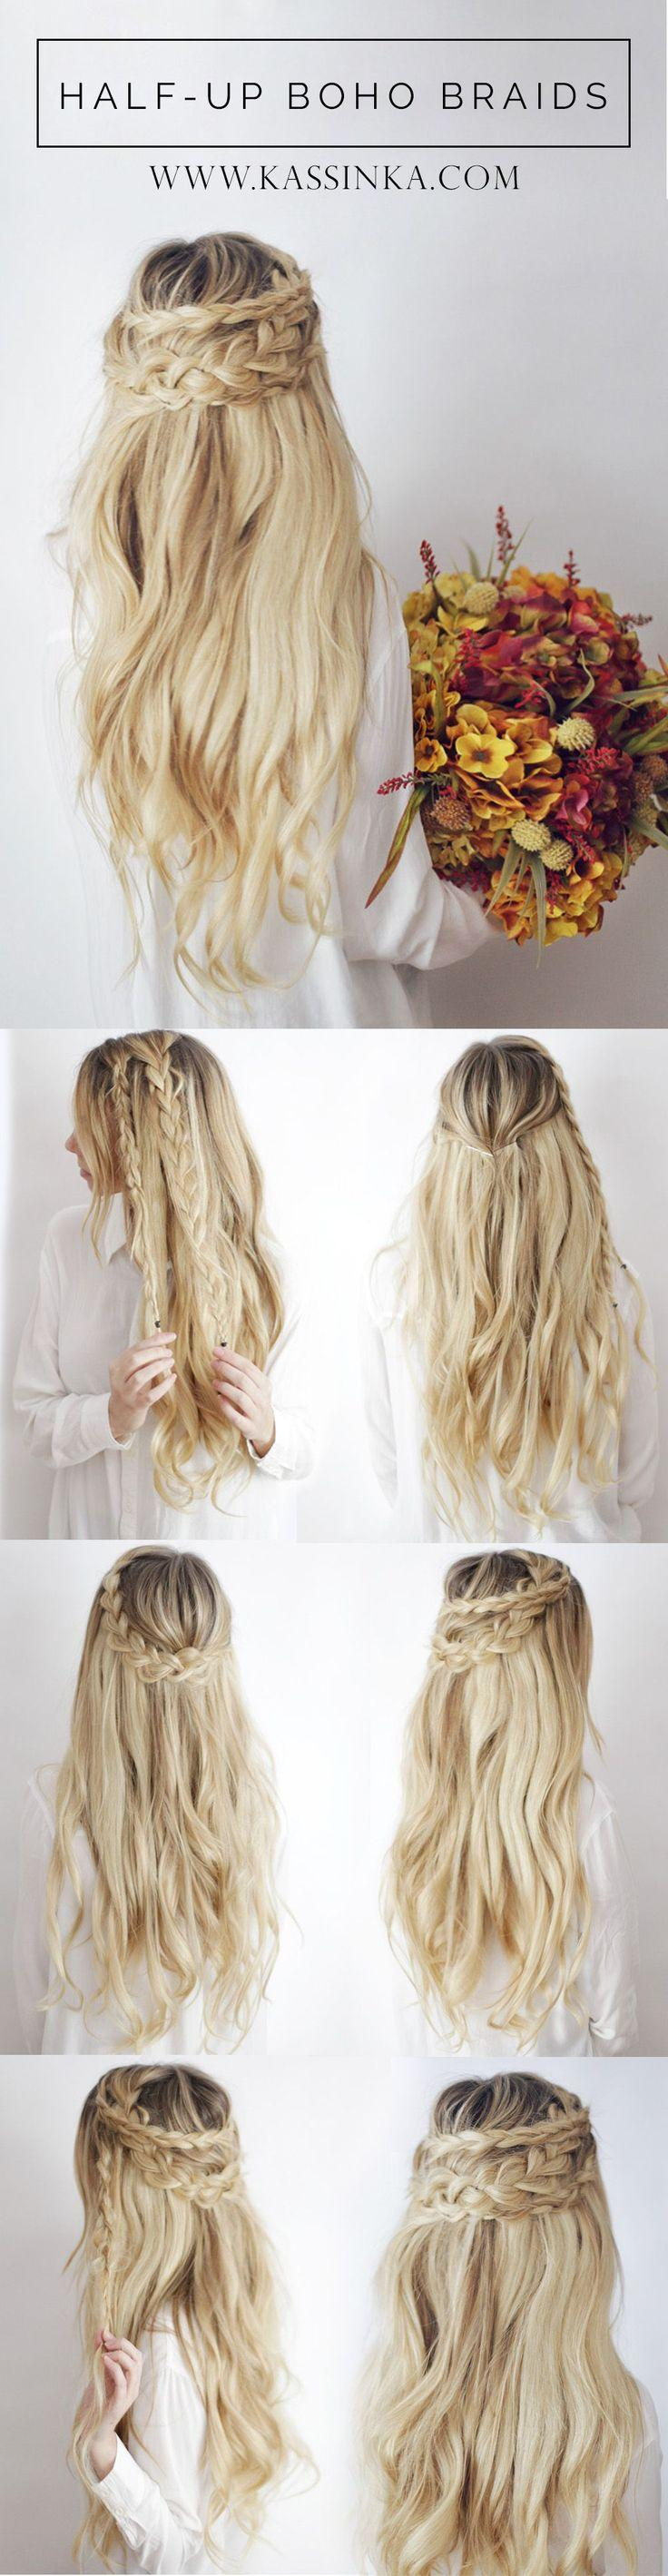 Свадьба - Half-up Boho Braids ┊ Hair TutorialKassinka